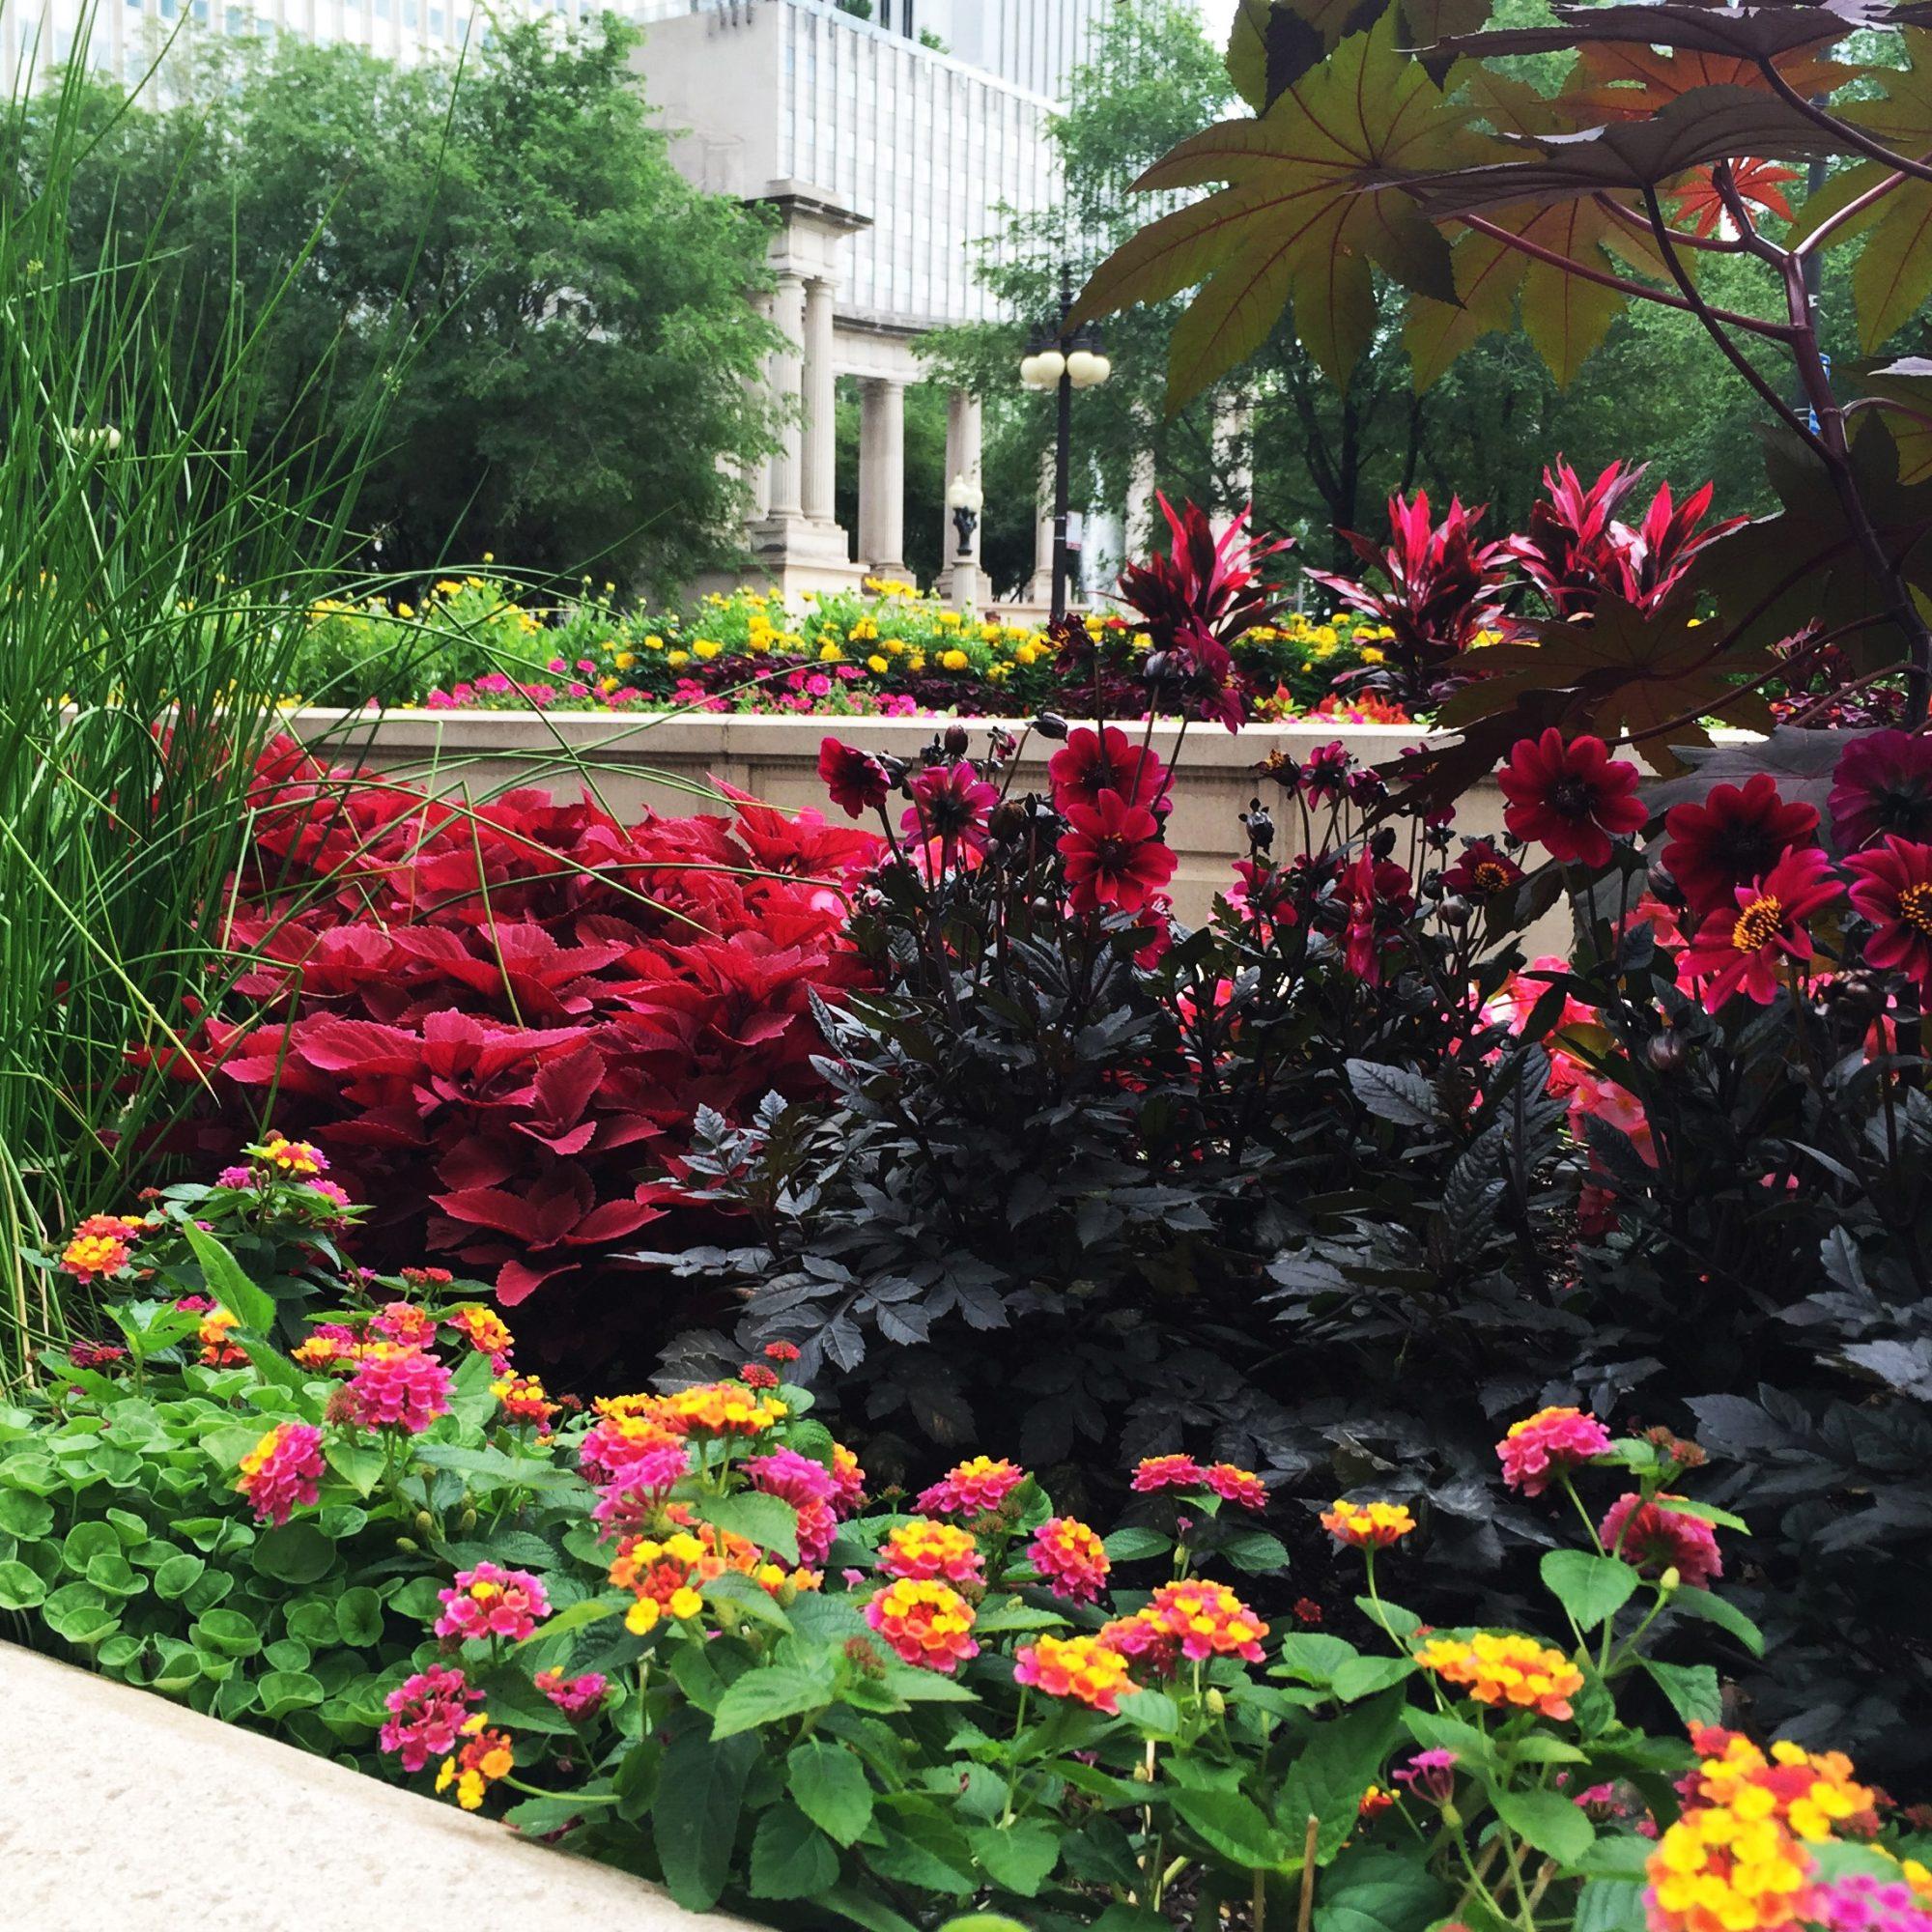 Michigan Avenue summer floral displays Chicago